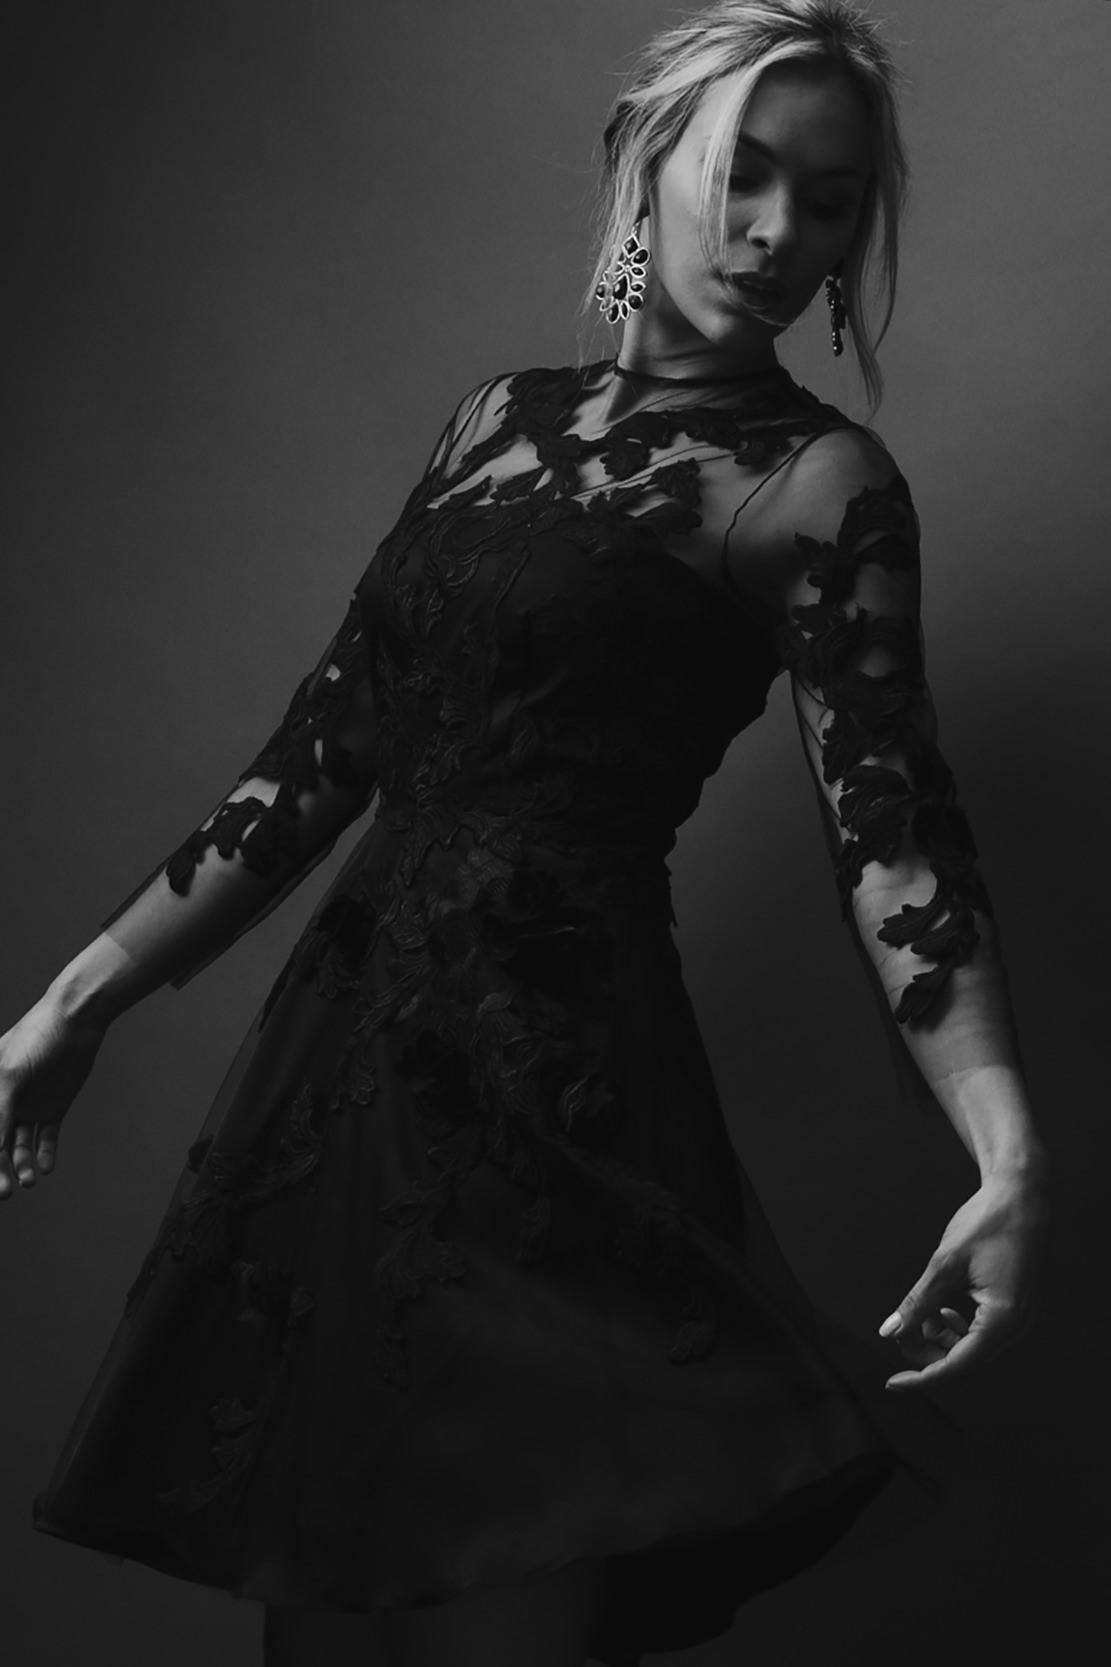 shanie-mioto-montagemodels-in-black-dress-in-studio.jpg